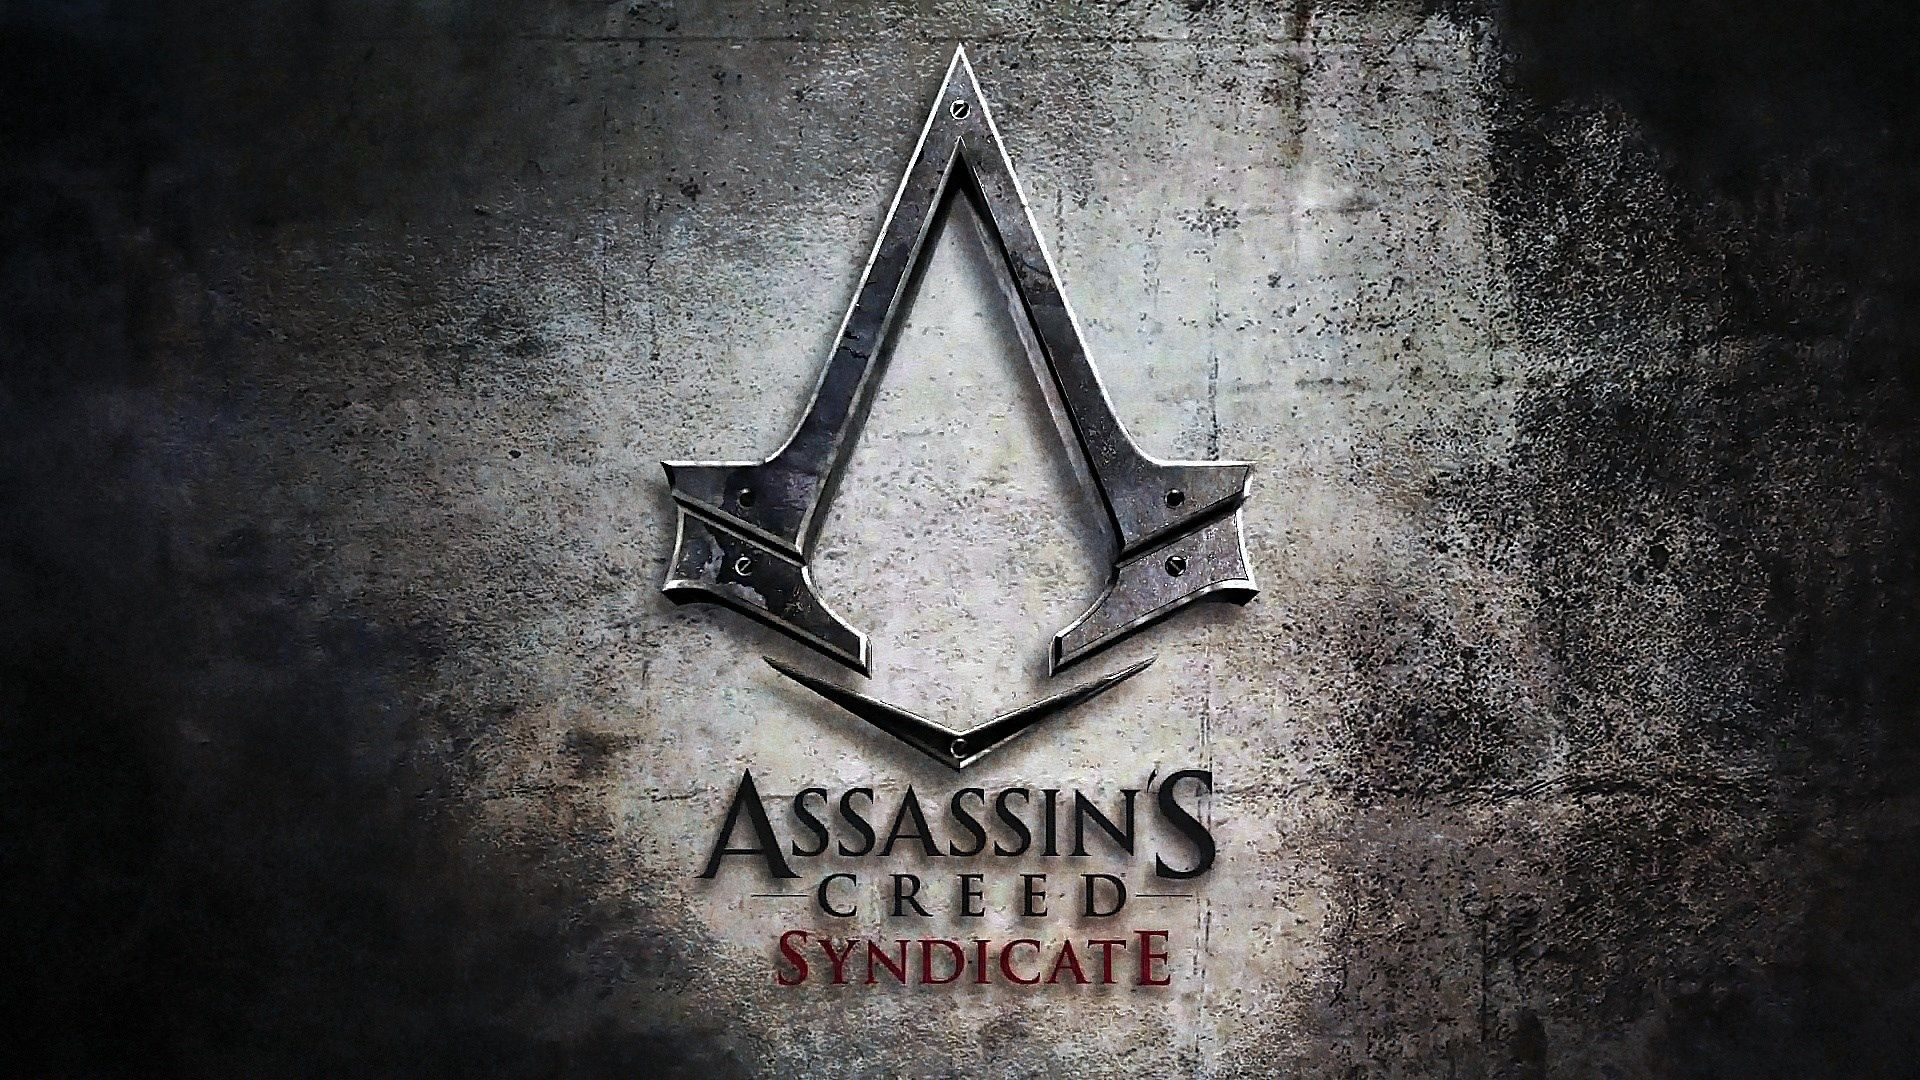 Assassins Creed Logo Wallpapers Free Sdeerwallpaper Assassin S Creed Wallpaper Assassins Creed Syndicate Assassins Creed